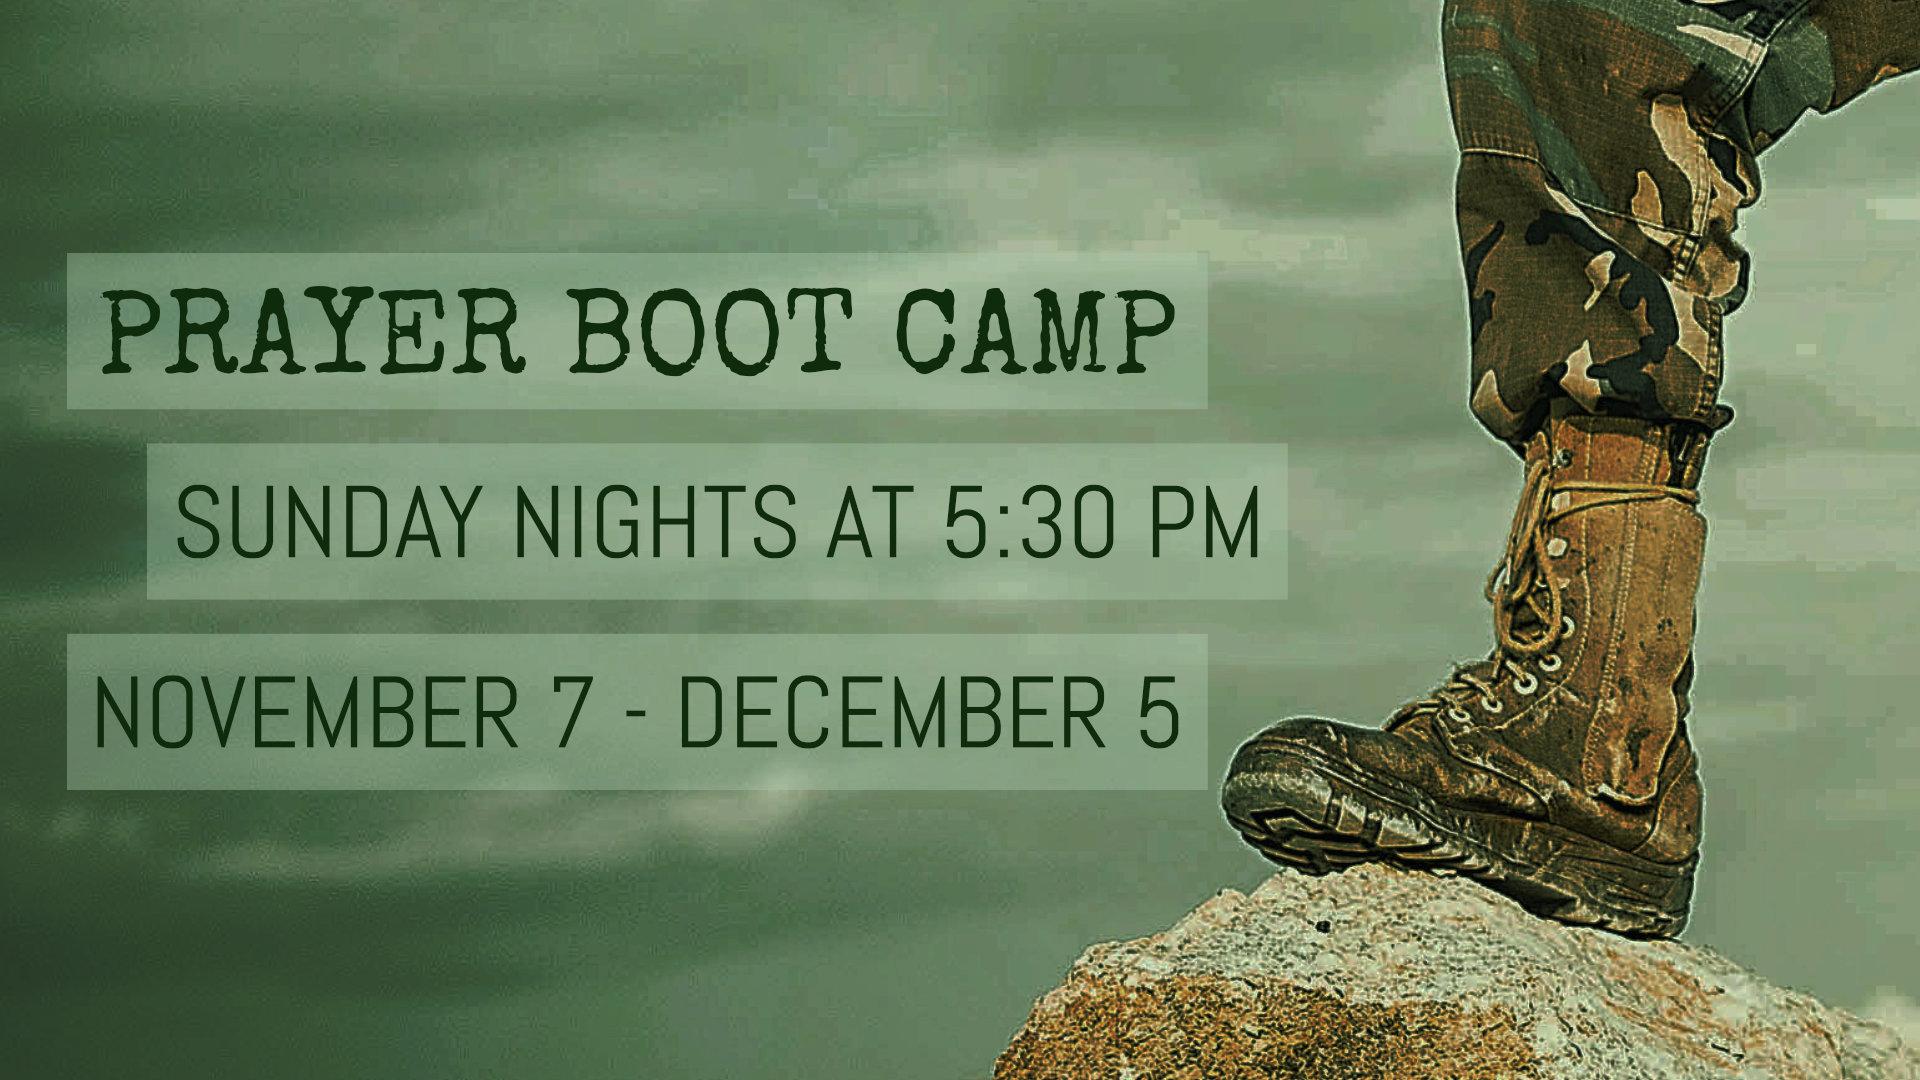 Prayer Boot Camp - Sunday Nights 5:30 PM. November 7 - December 5